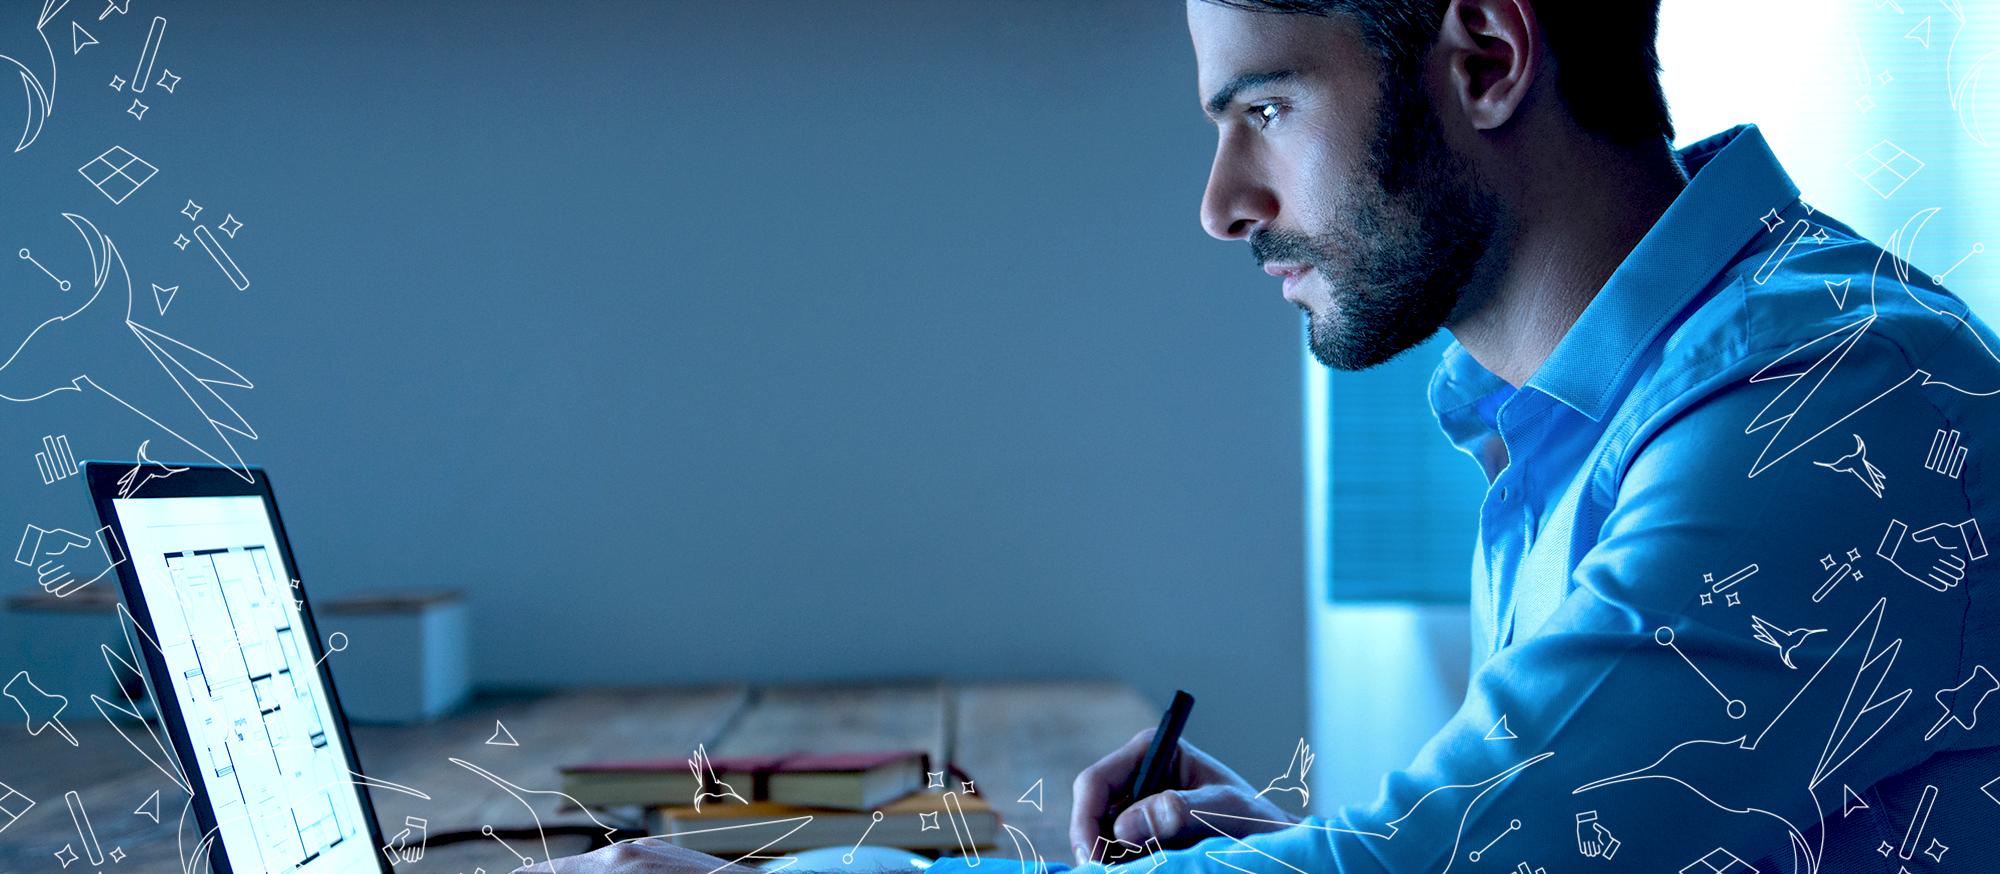 AutoCAD Courses: Man Using AutoCAD on Laptop